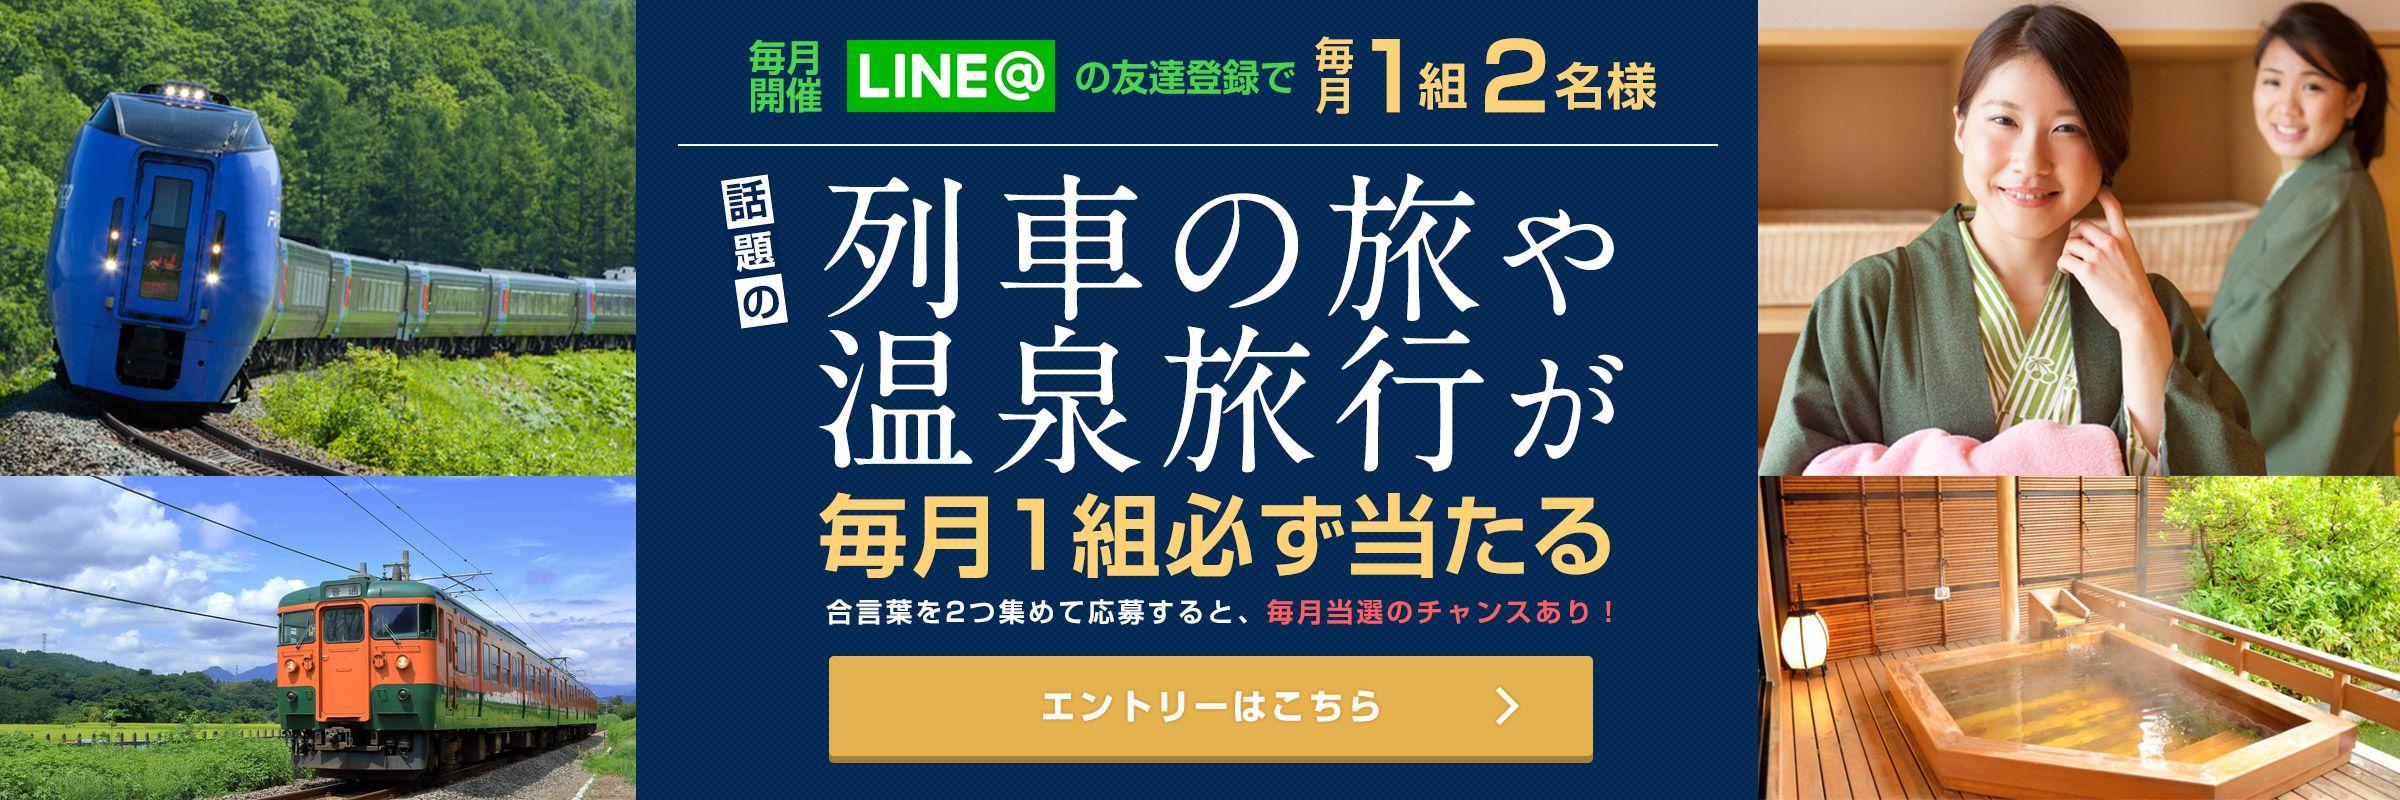 LINE@列車の旅や温泉旅行が当たるキャンペーン